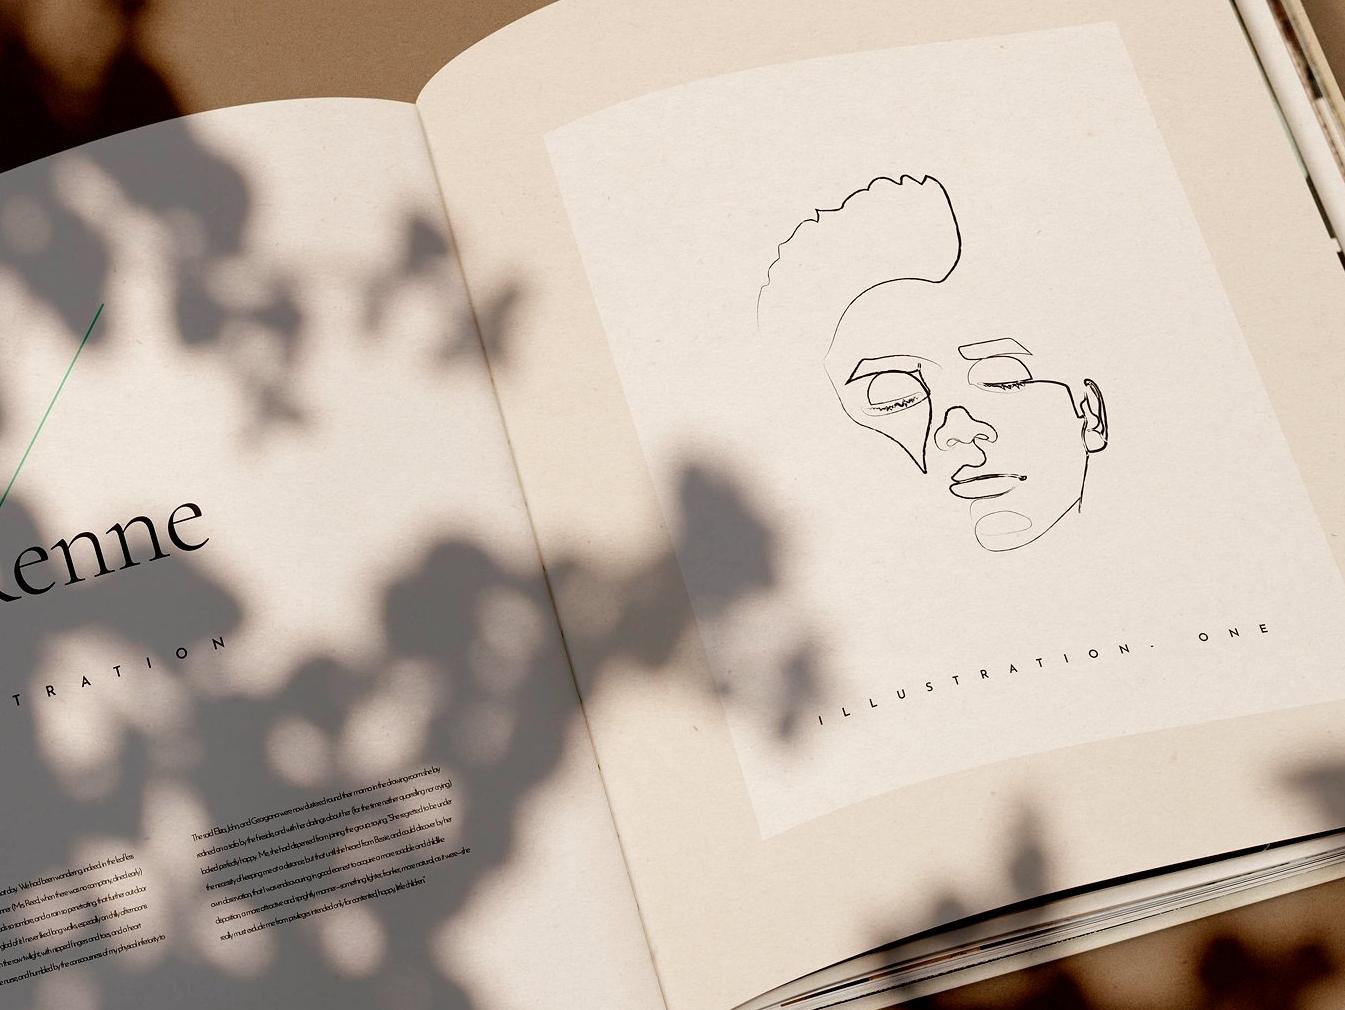 5figara line drawings delightful design3